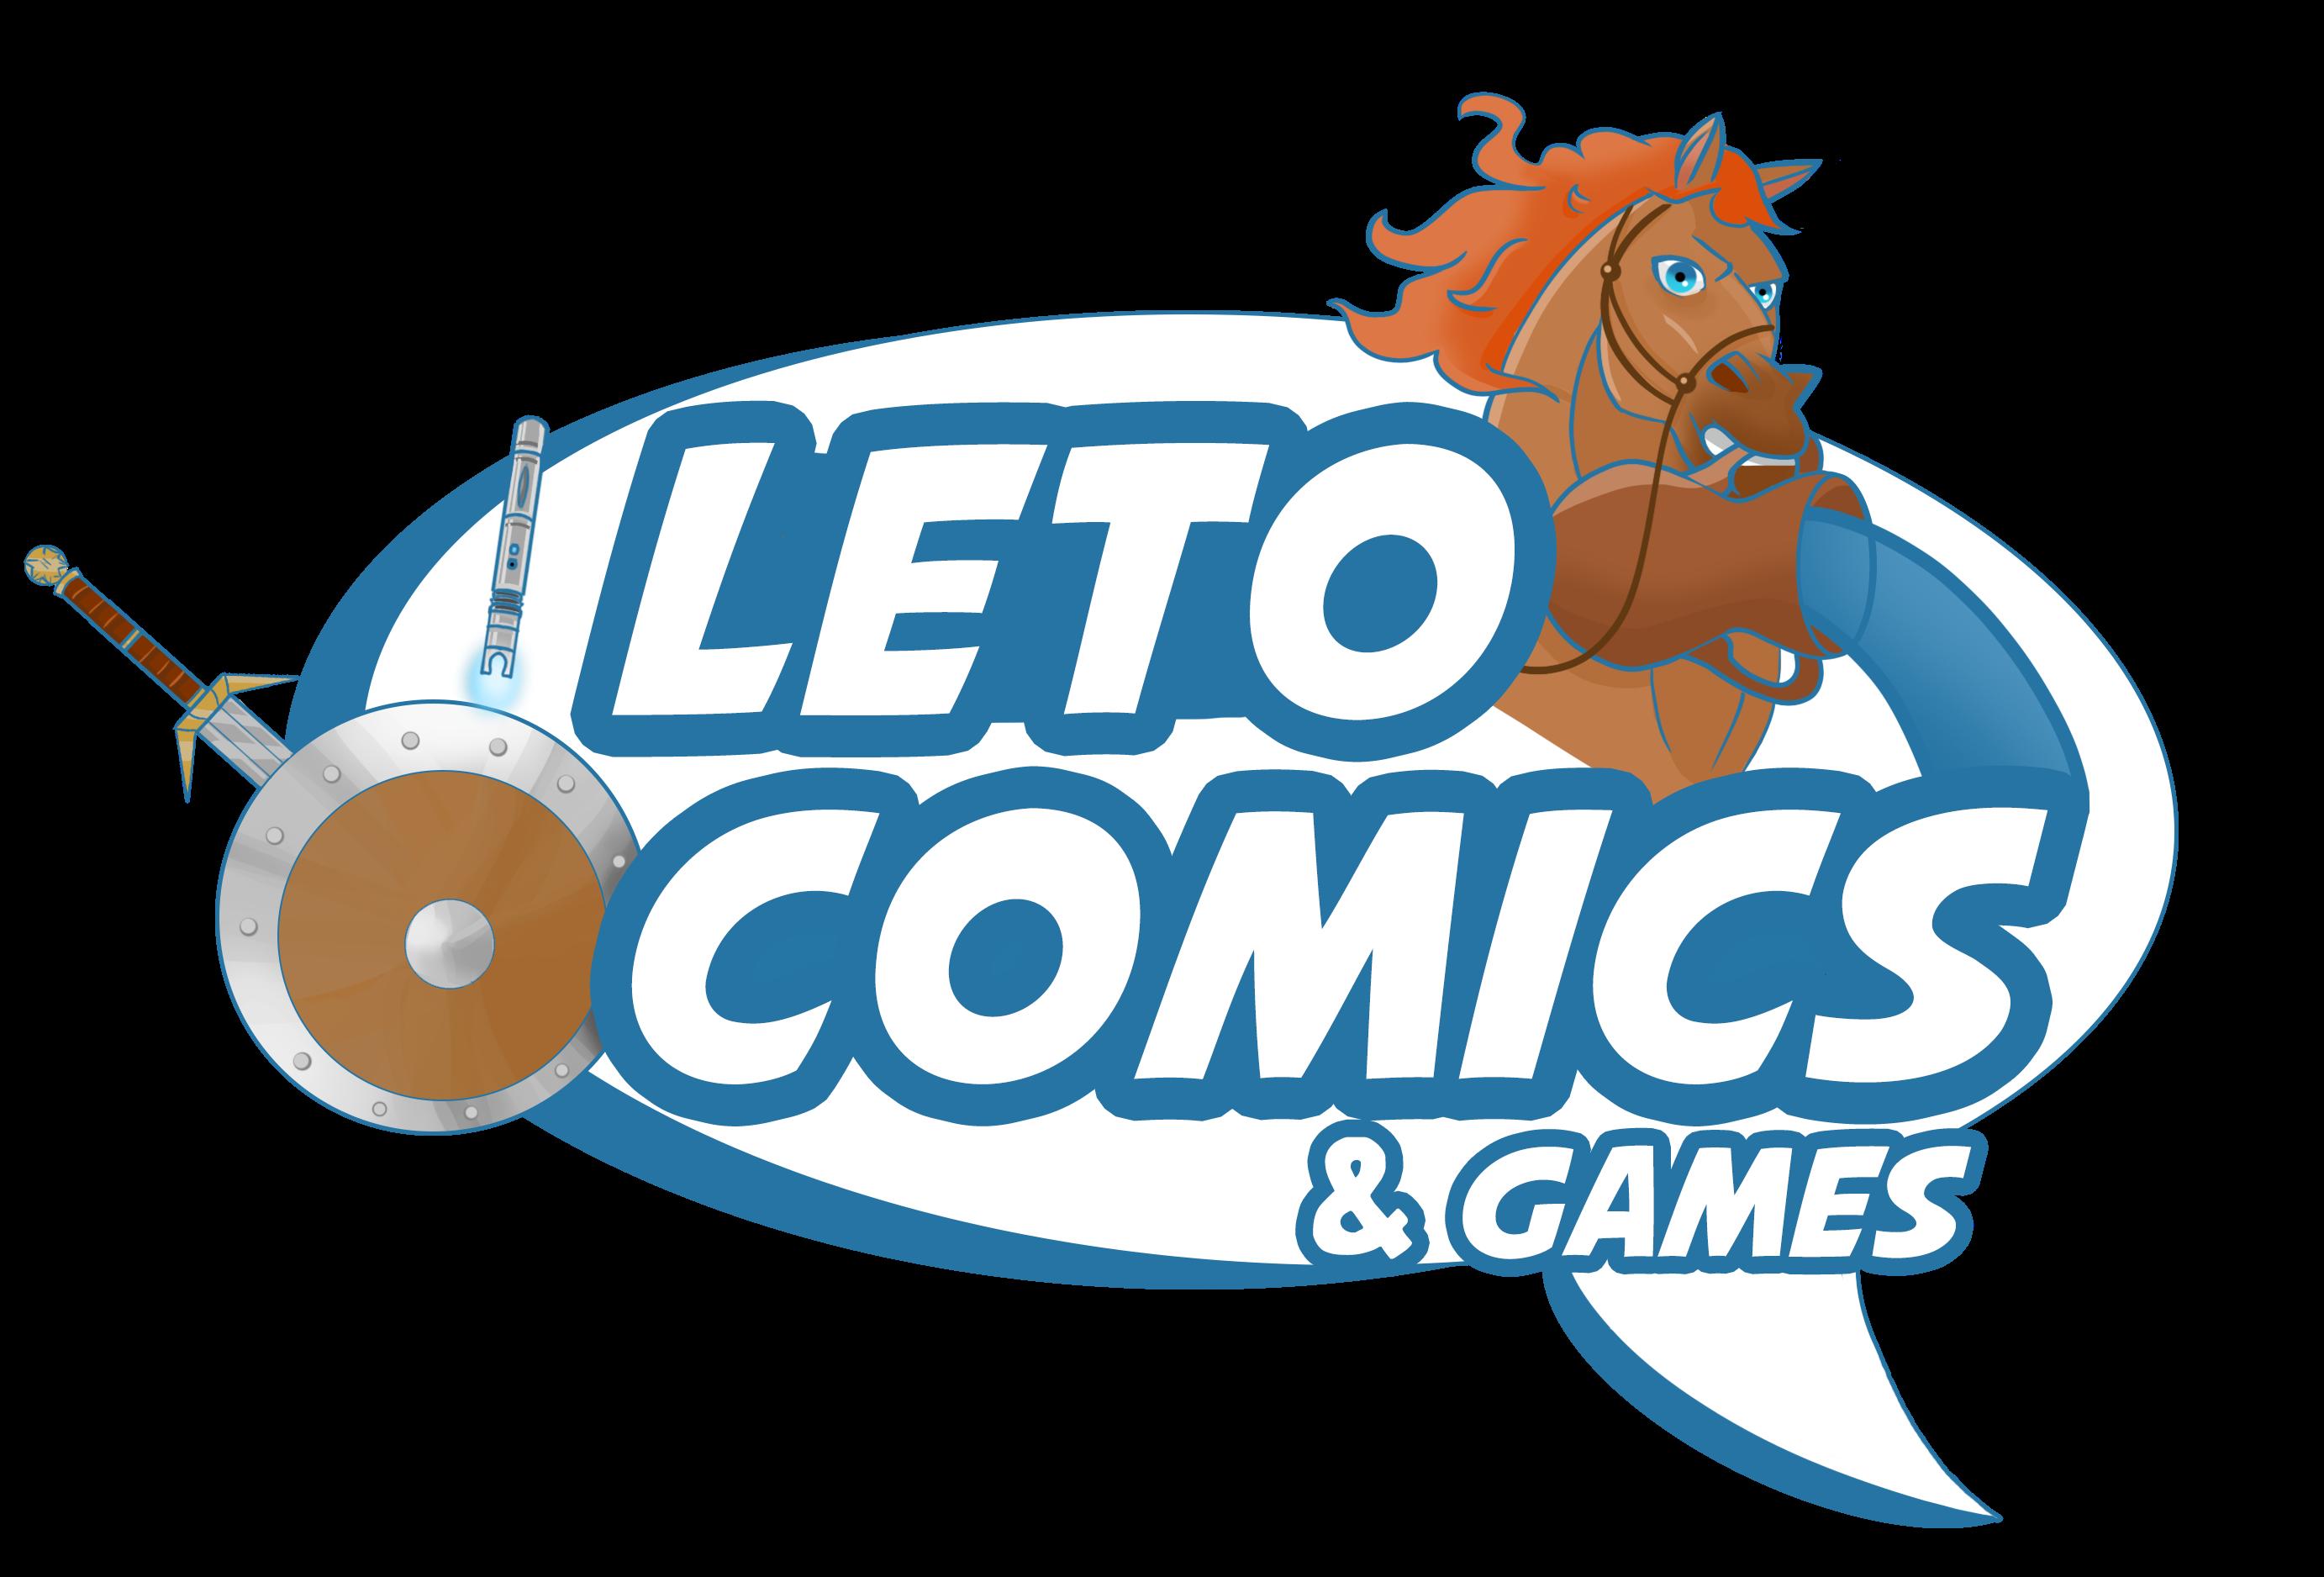 Leto Comics